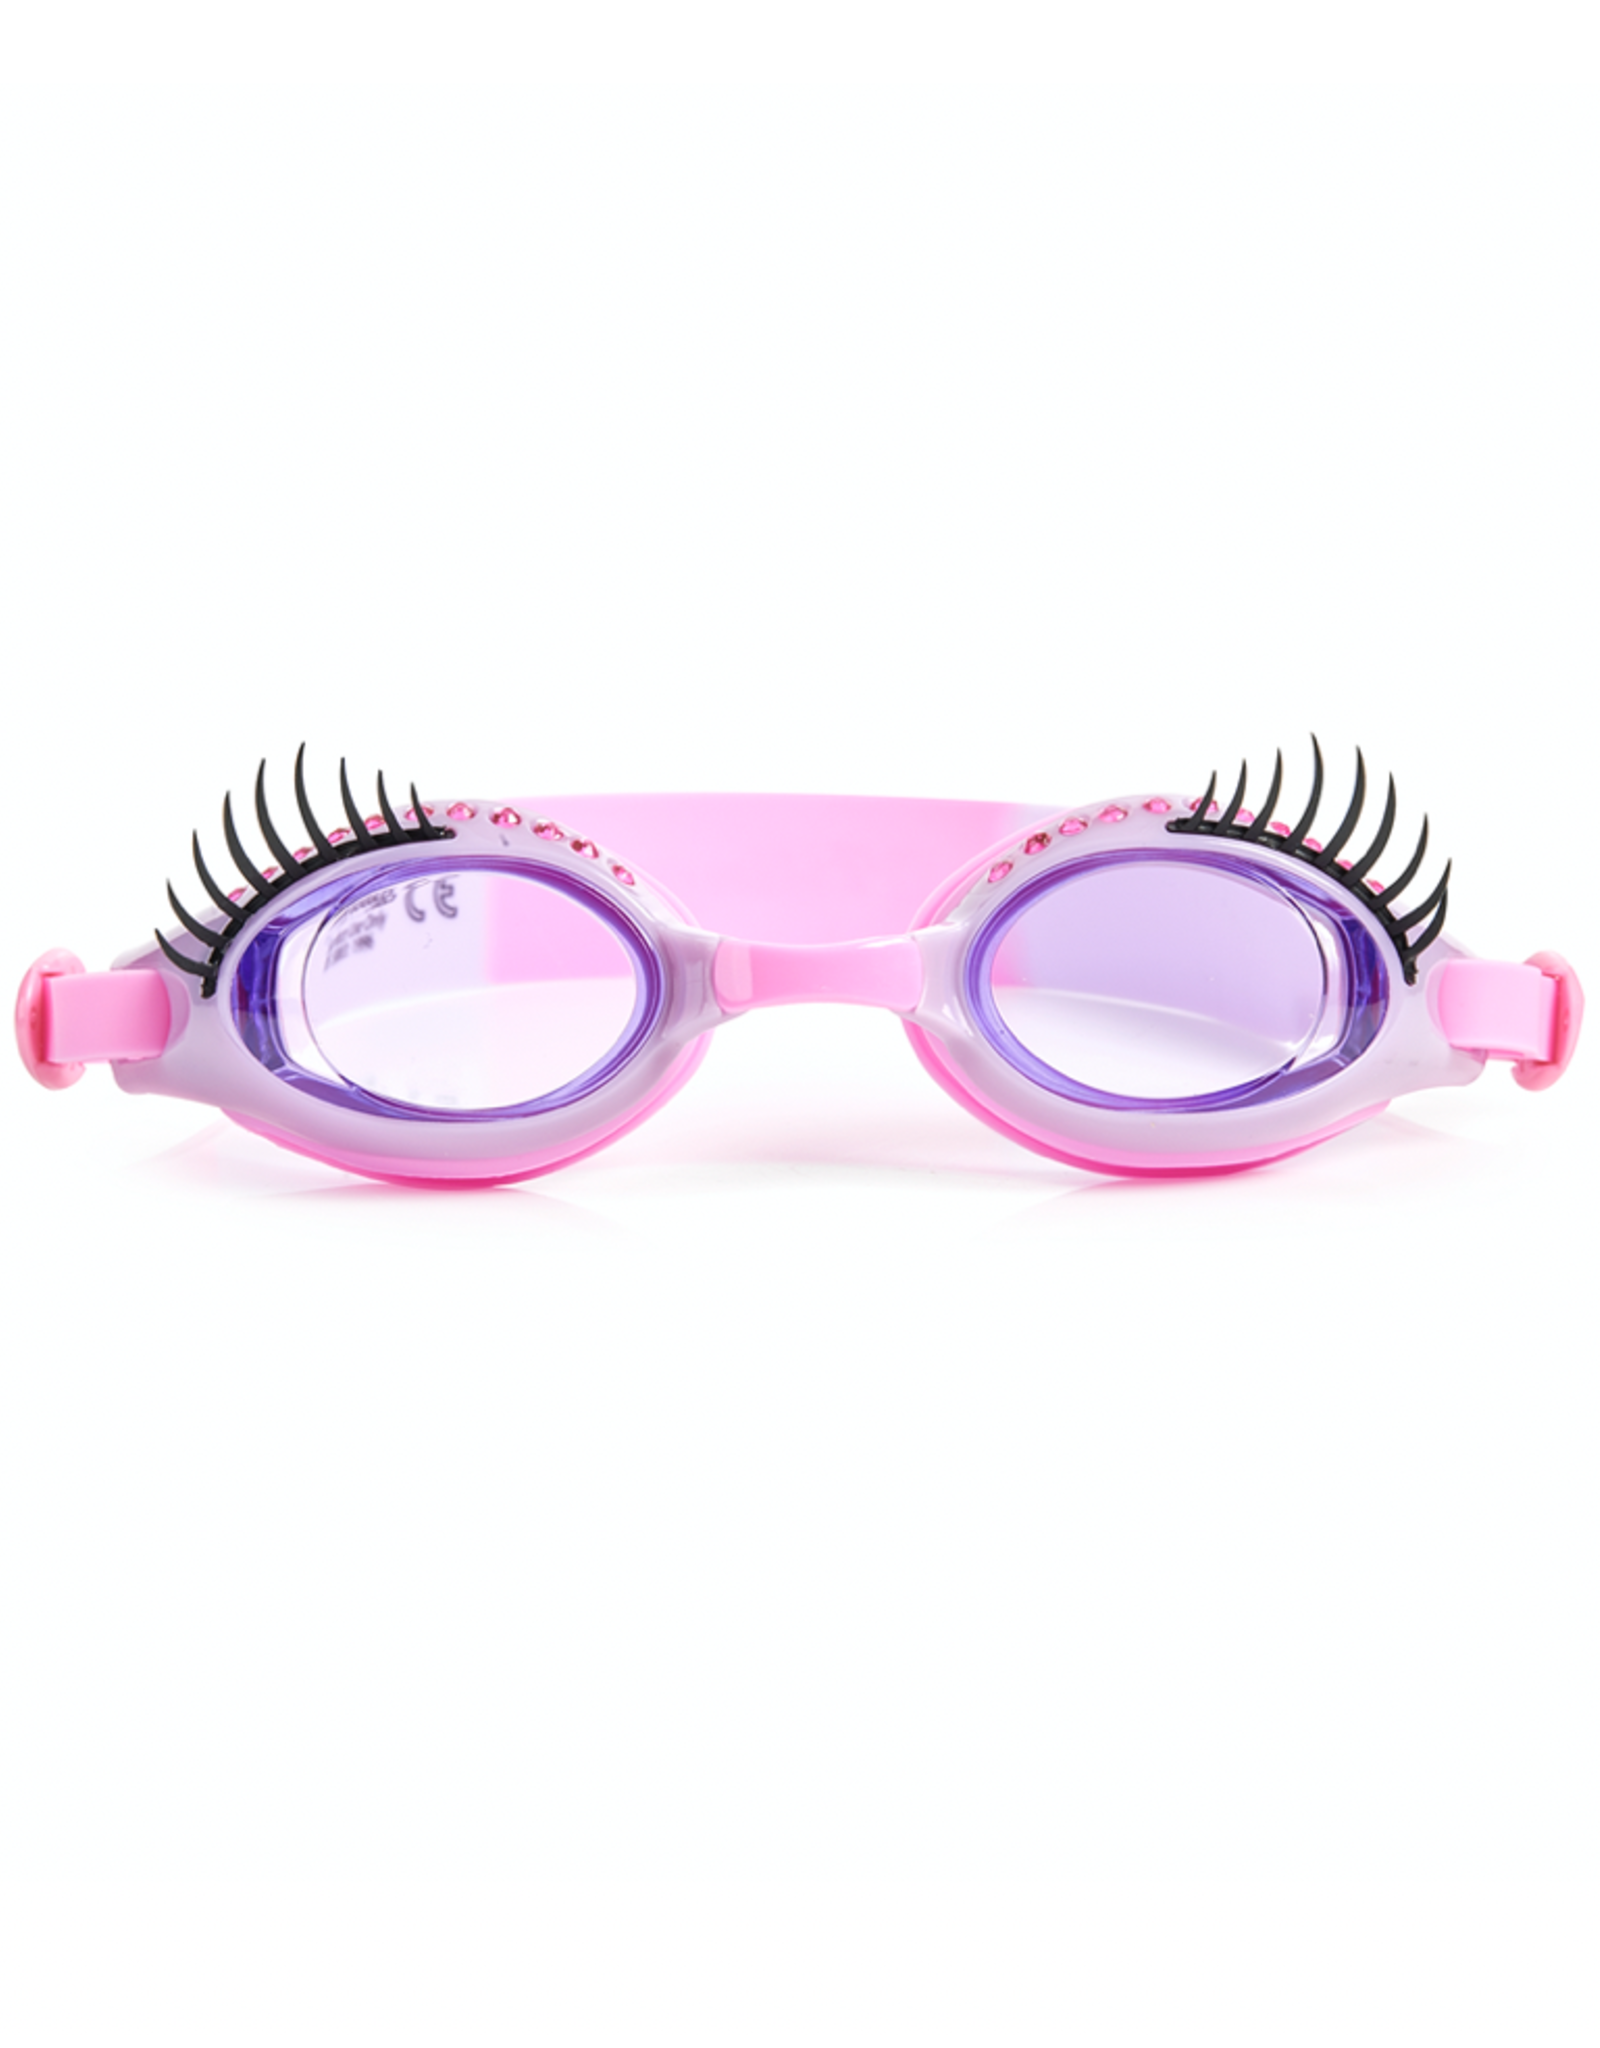 Bling2o Bling2o Goggles - Glam Lash Make Up Artist Purple